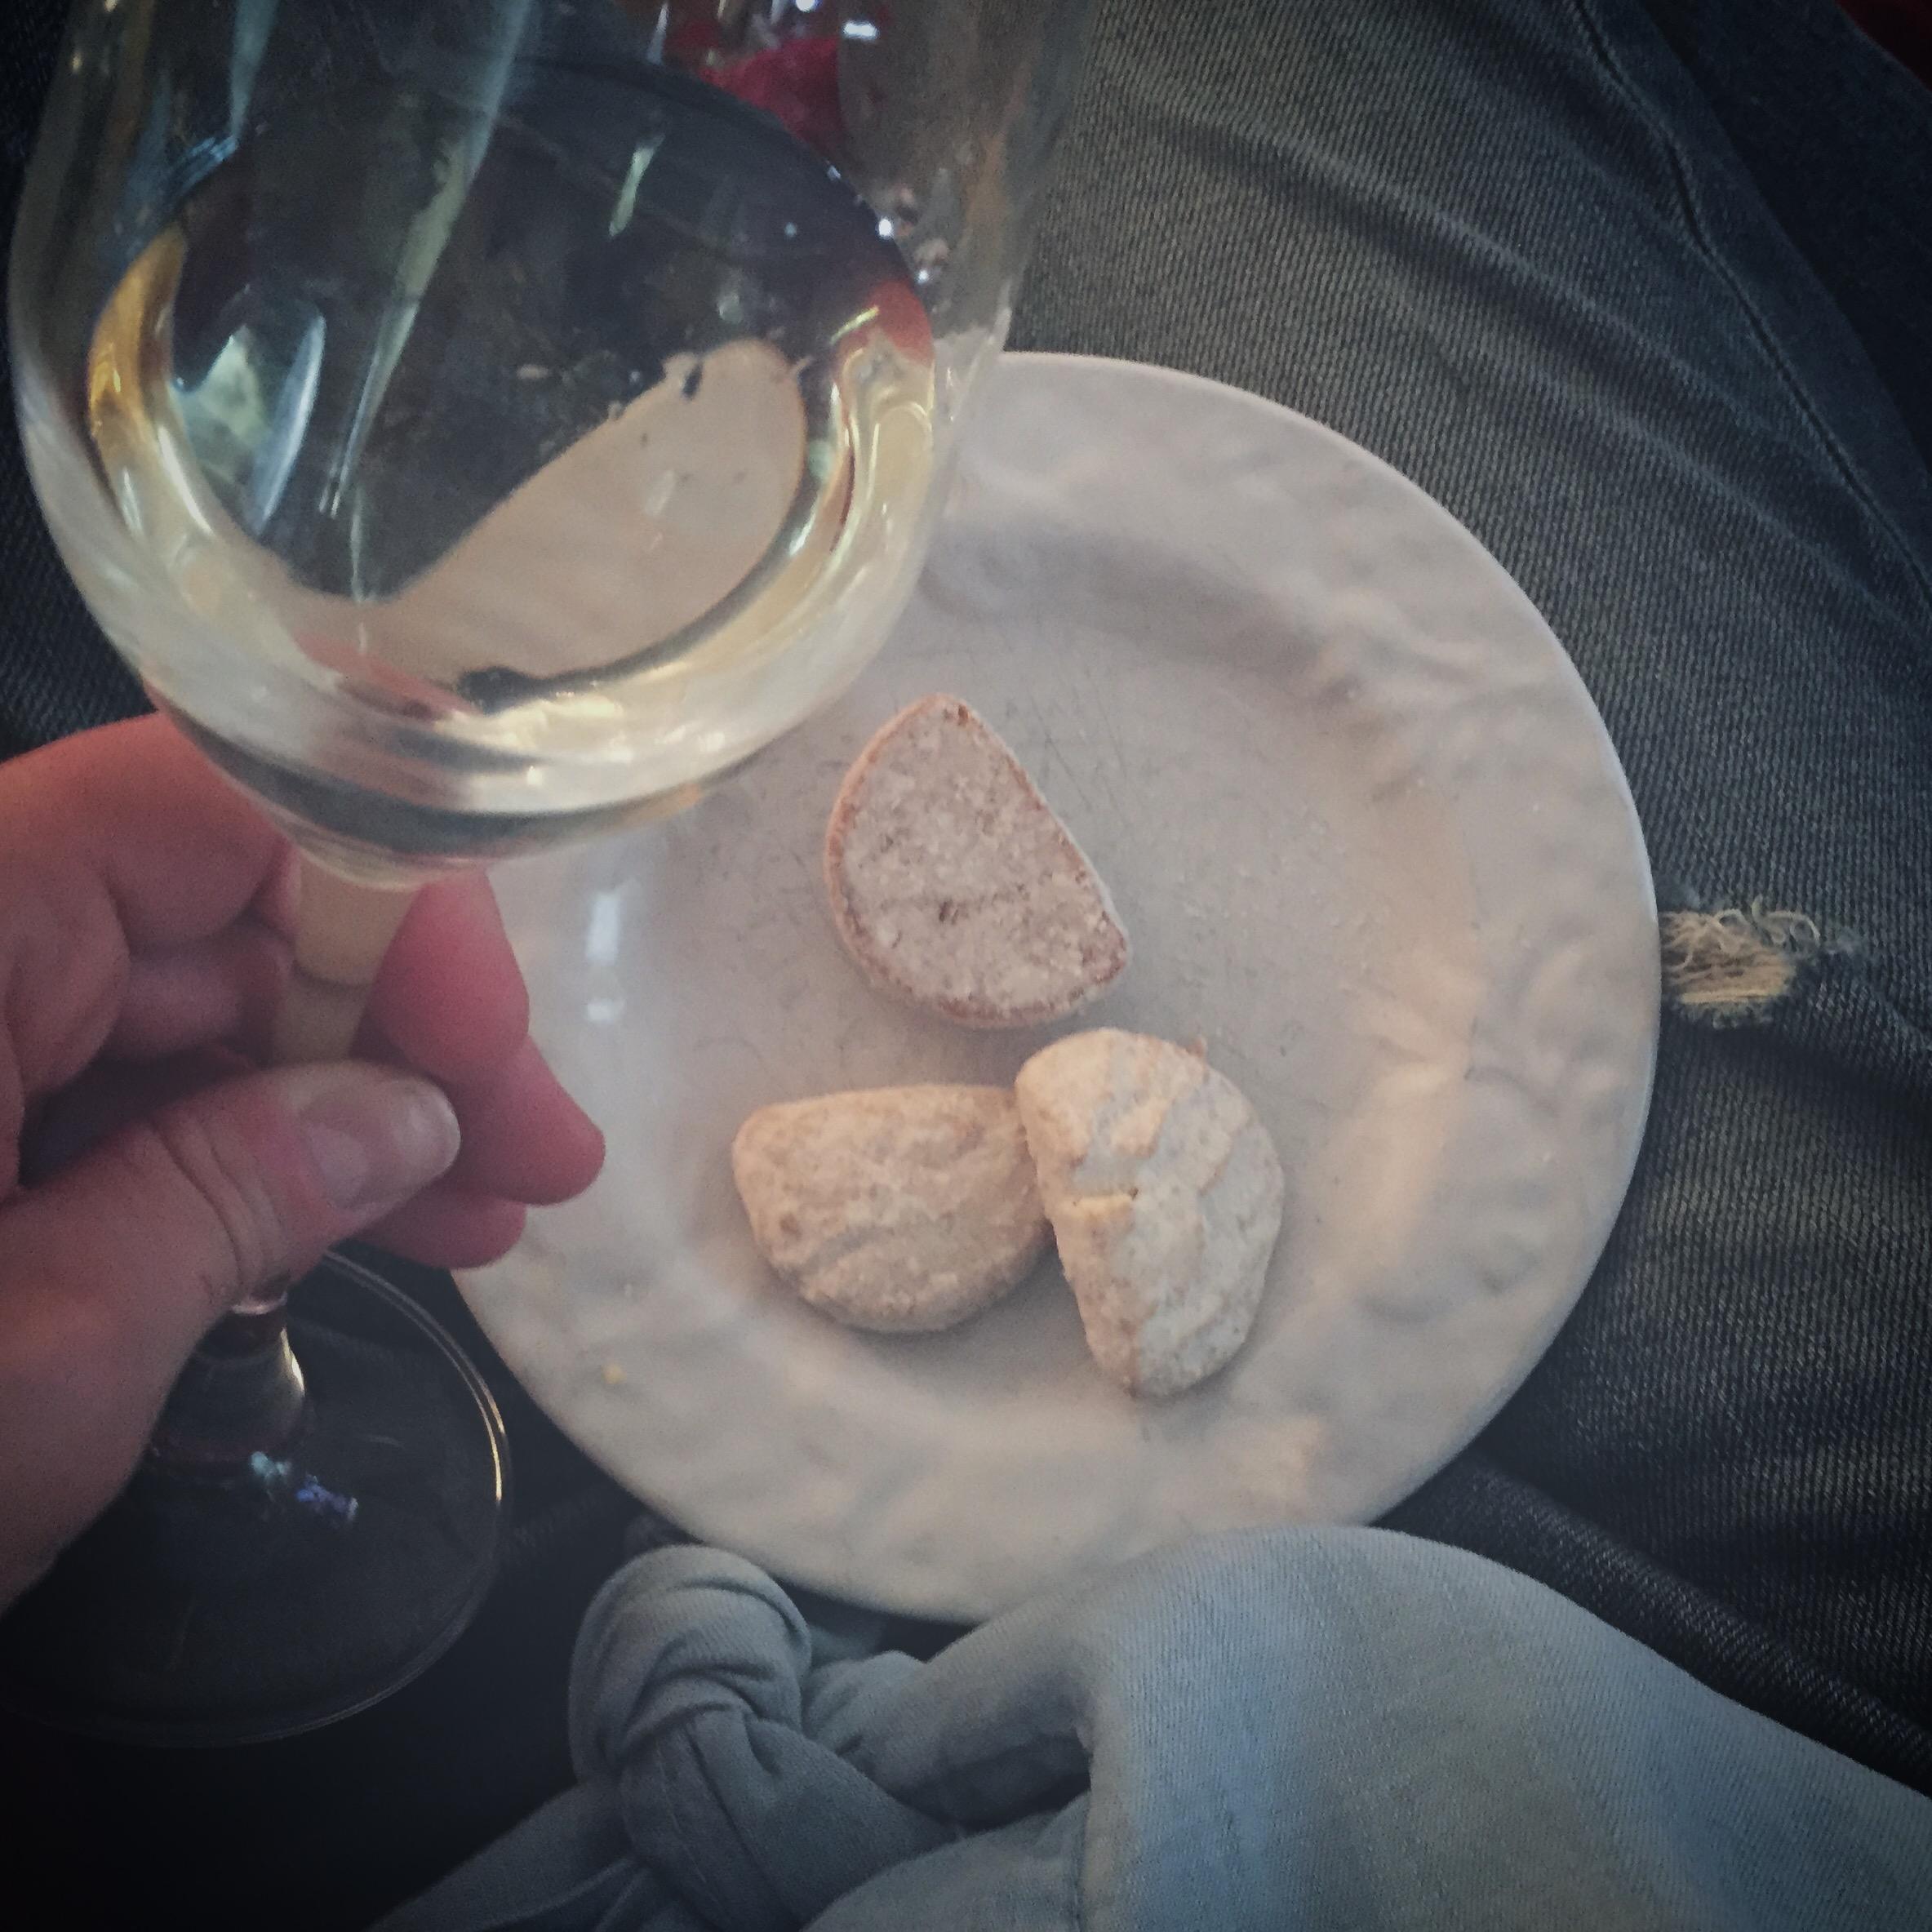 Sauvignon Blanc and Savannah Smiles.